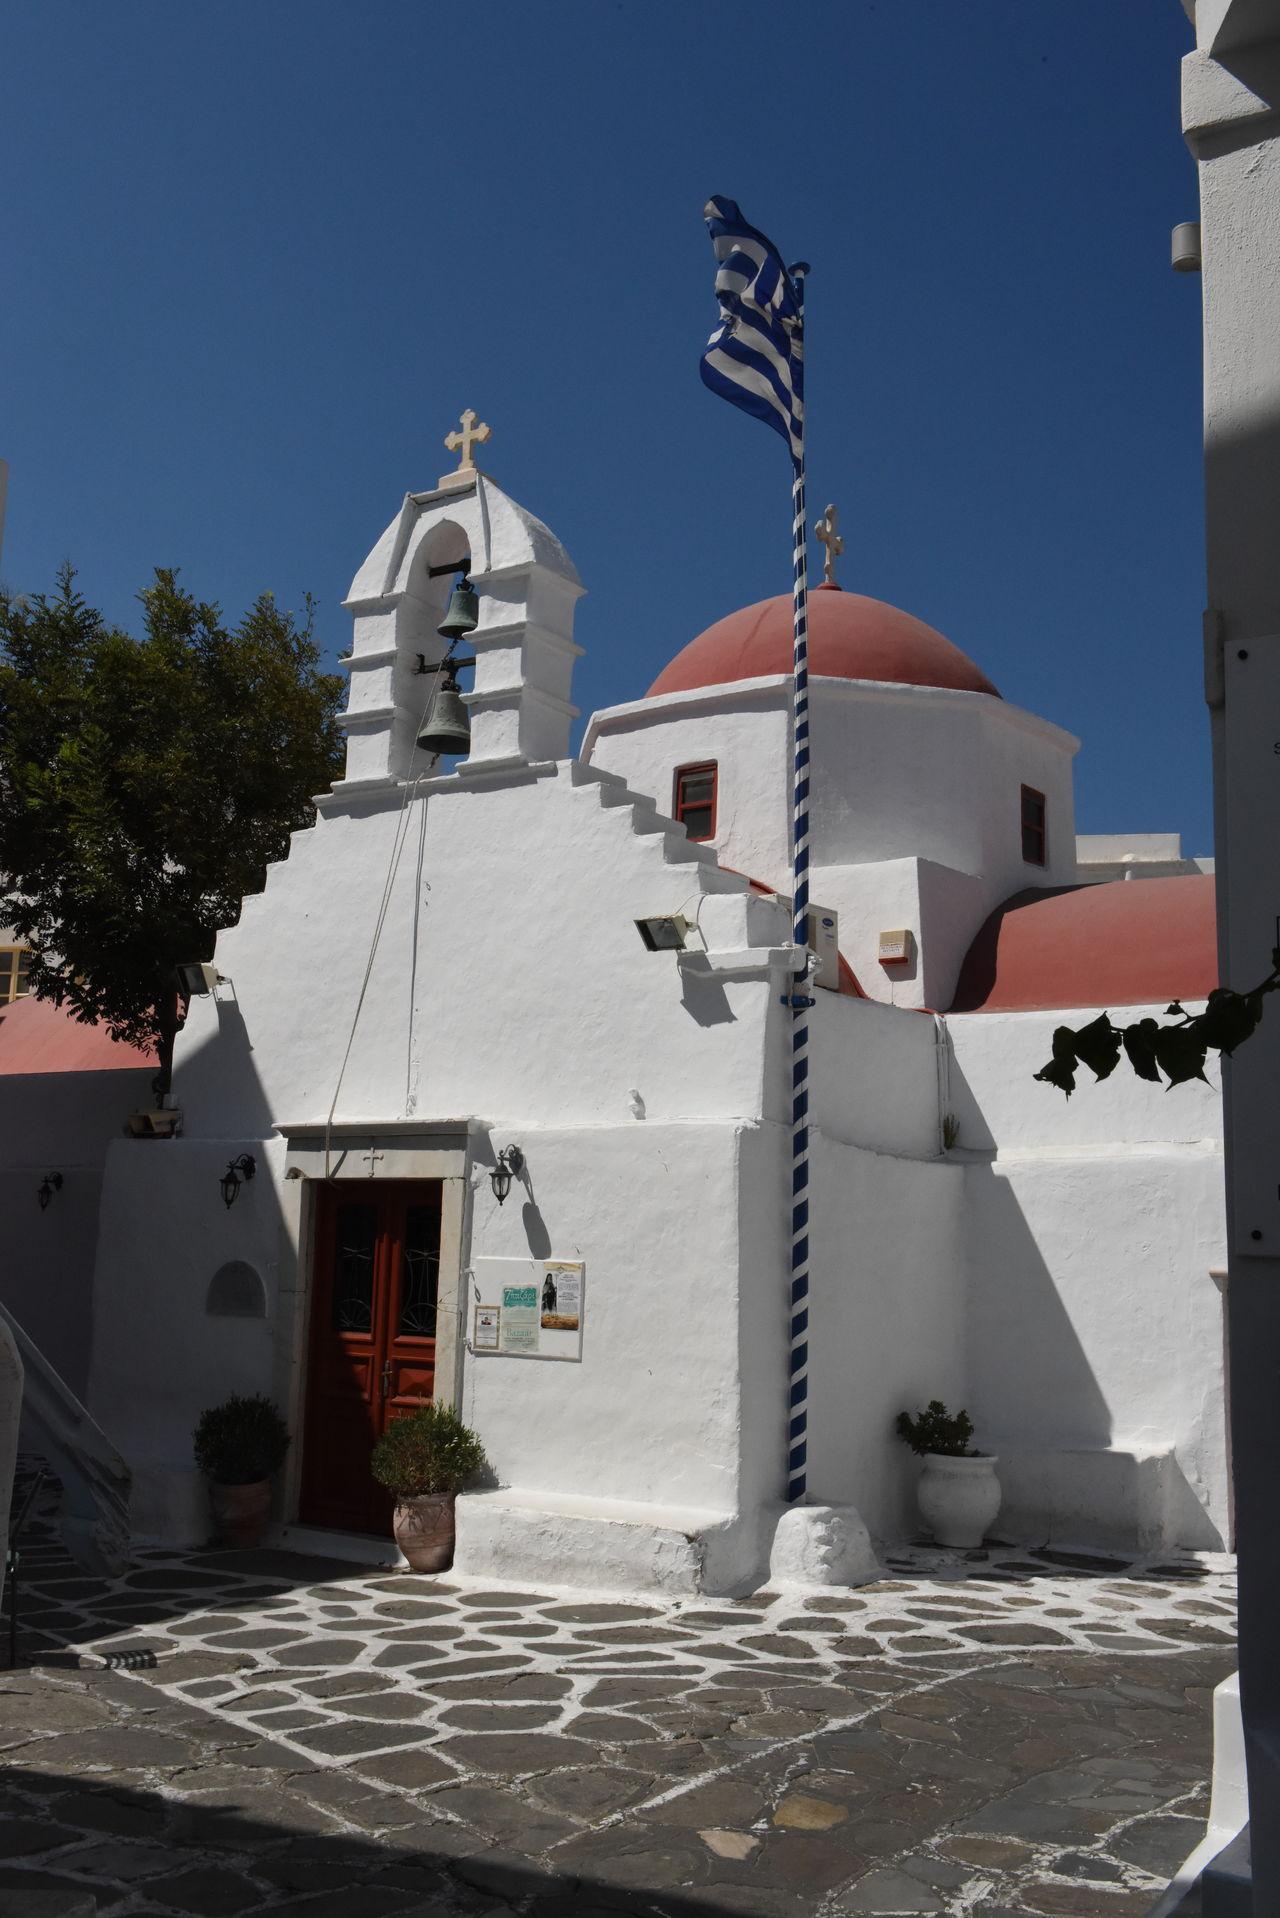 Aegean Aegean Islands Aegean Sea Blauer Himmel Blue Sky Church Greece GREECE ♥♥ Hellas Kirche Kykladen Kyklades Mykonos Mykonos,Greece Places Platz Straße Street ägaisches Meer ägäis ägäische Inseln